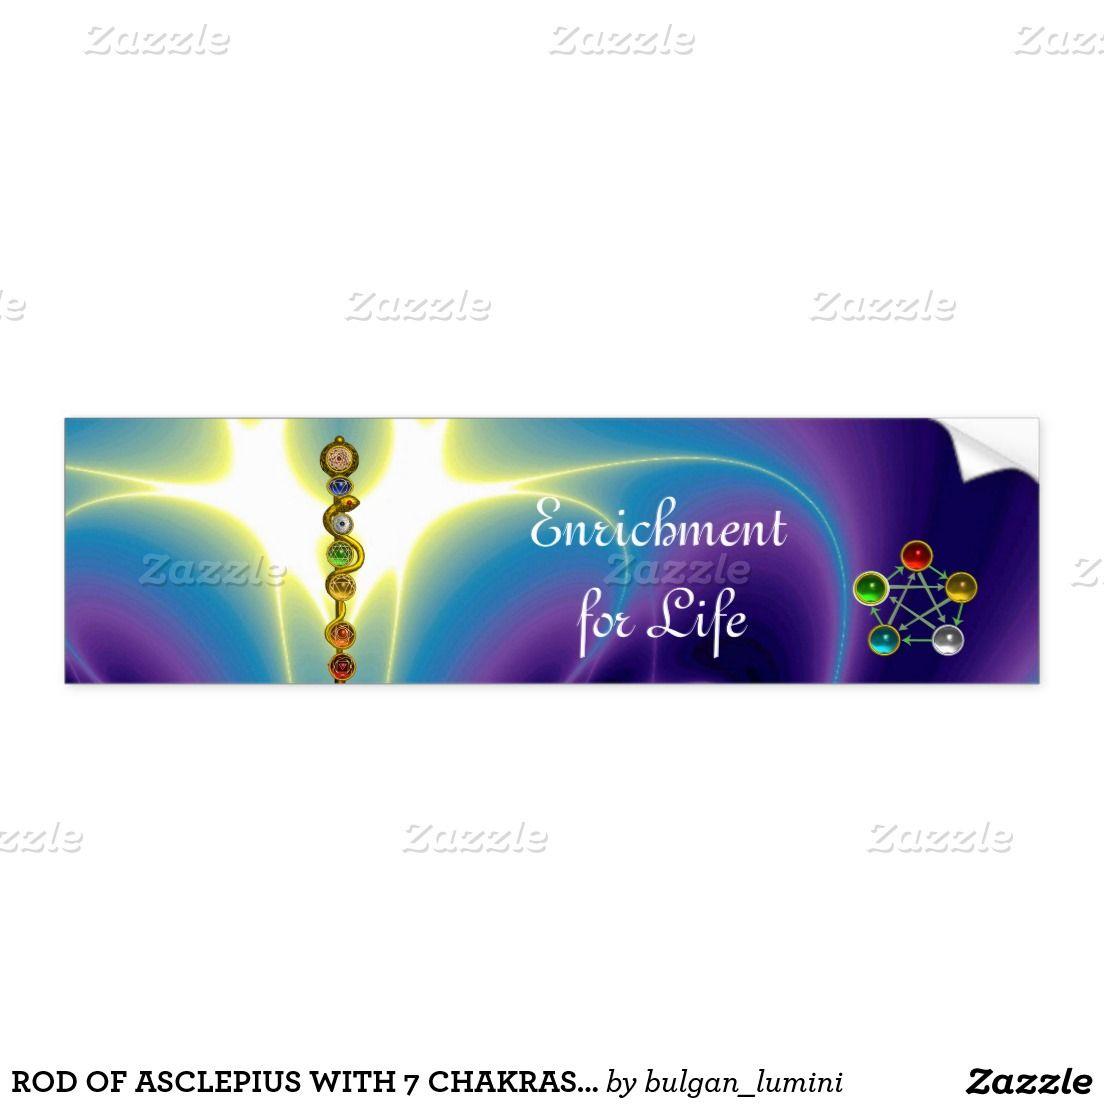 Rod Of Asclepius With 7 Chakras Spiritual Energy Bumper Sticker Zazzle Com Spirituality Energy Bumper Stickers Car Bumper Stickers [ 1104 x 1104 Pixel ]